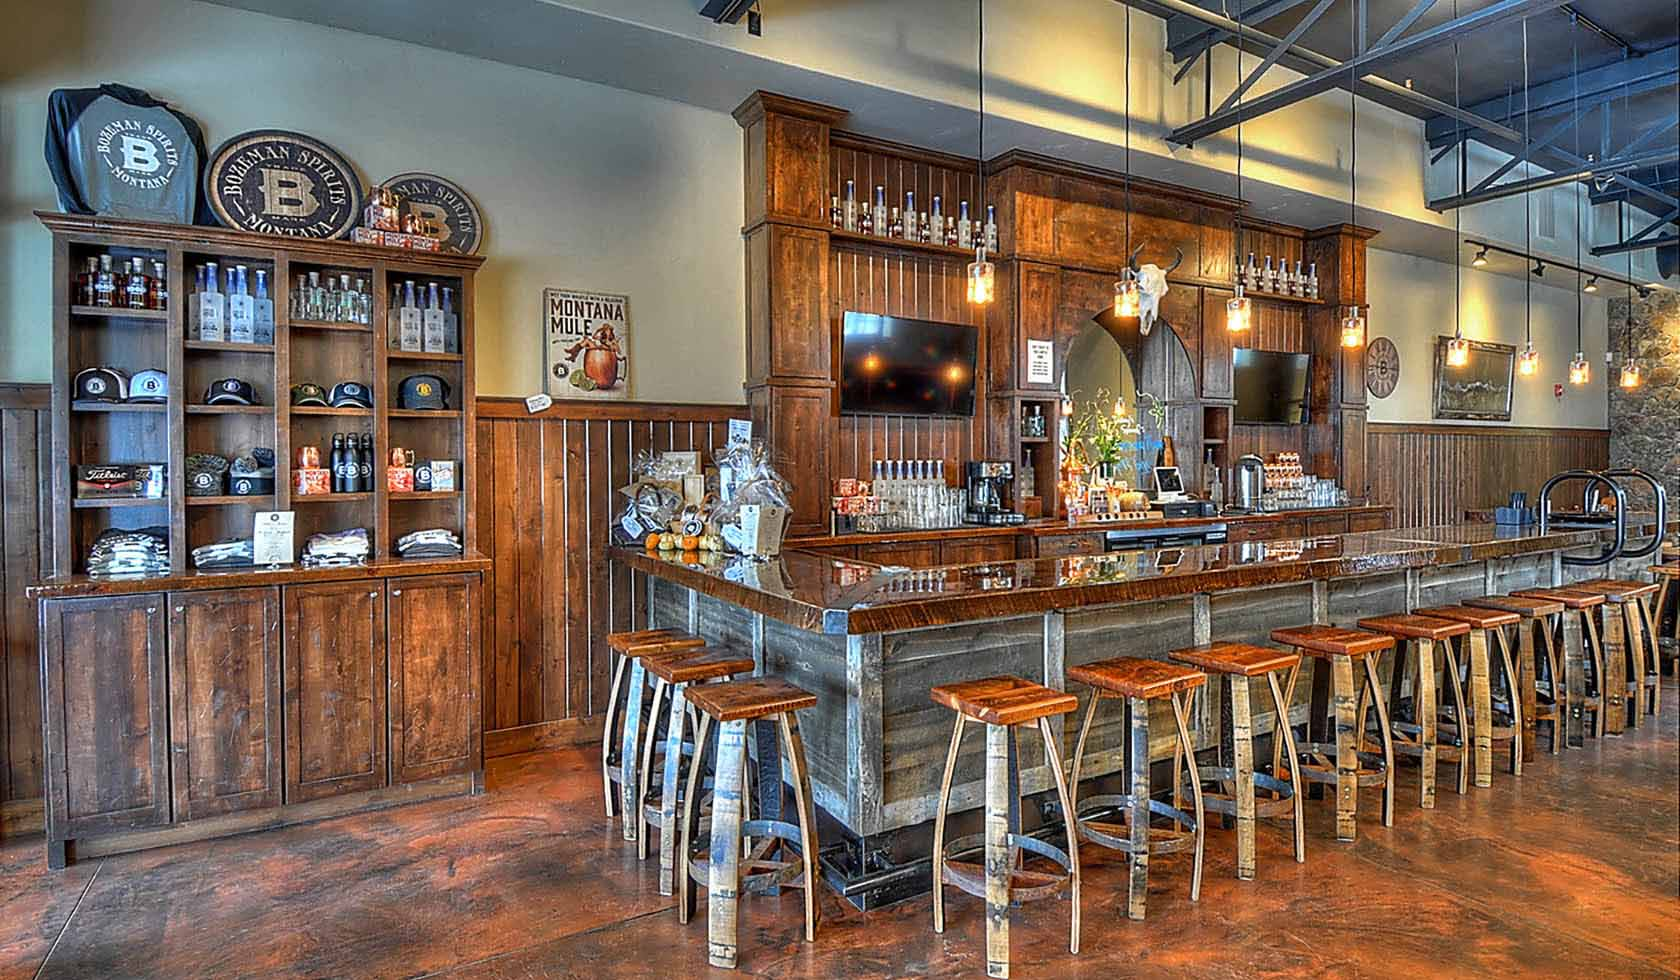 Bozeman Spirits Distillery profile image